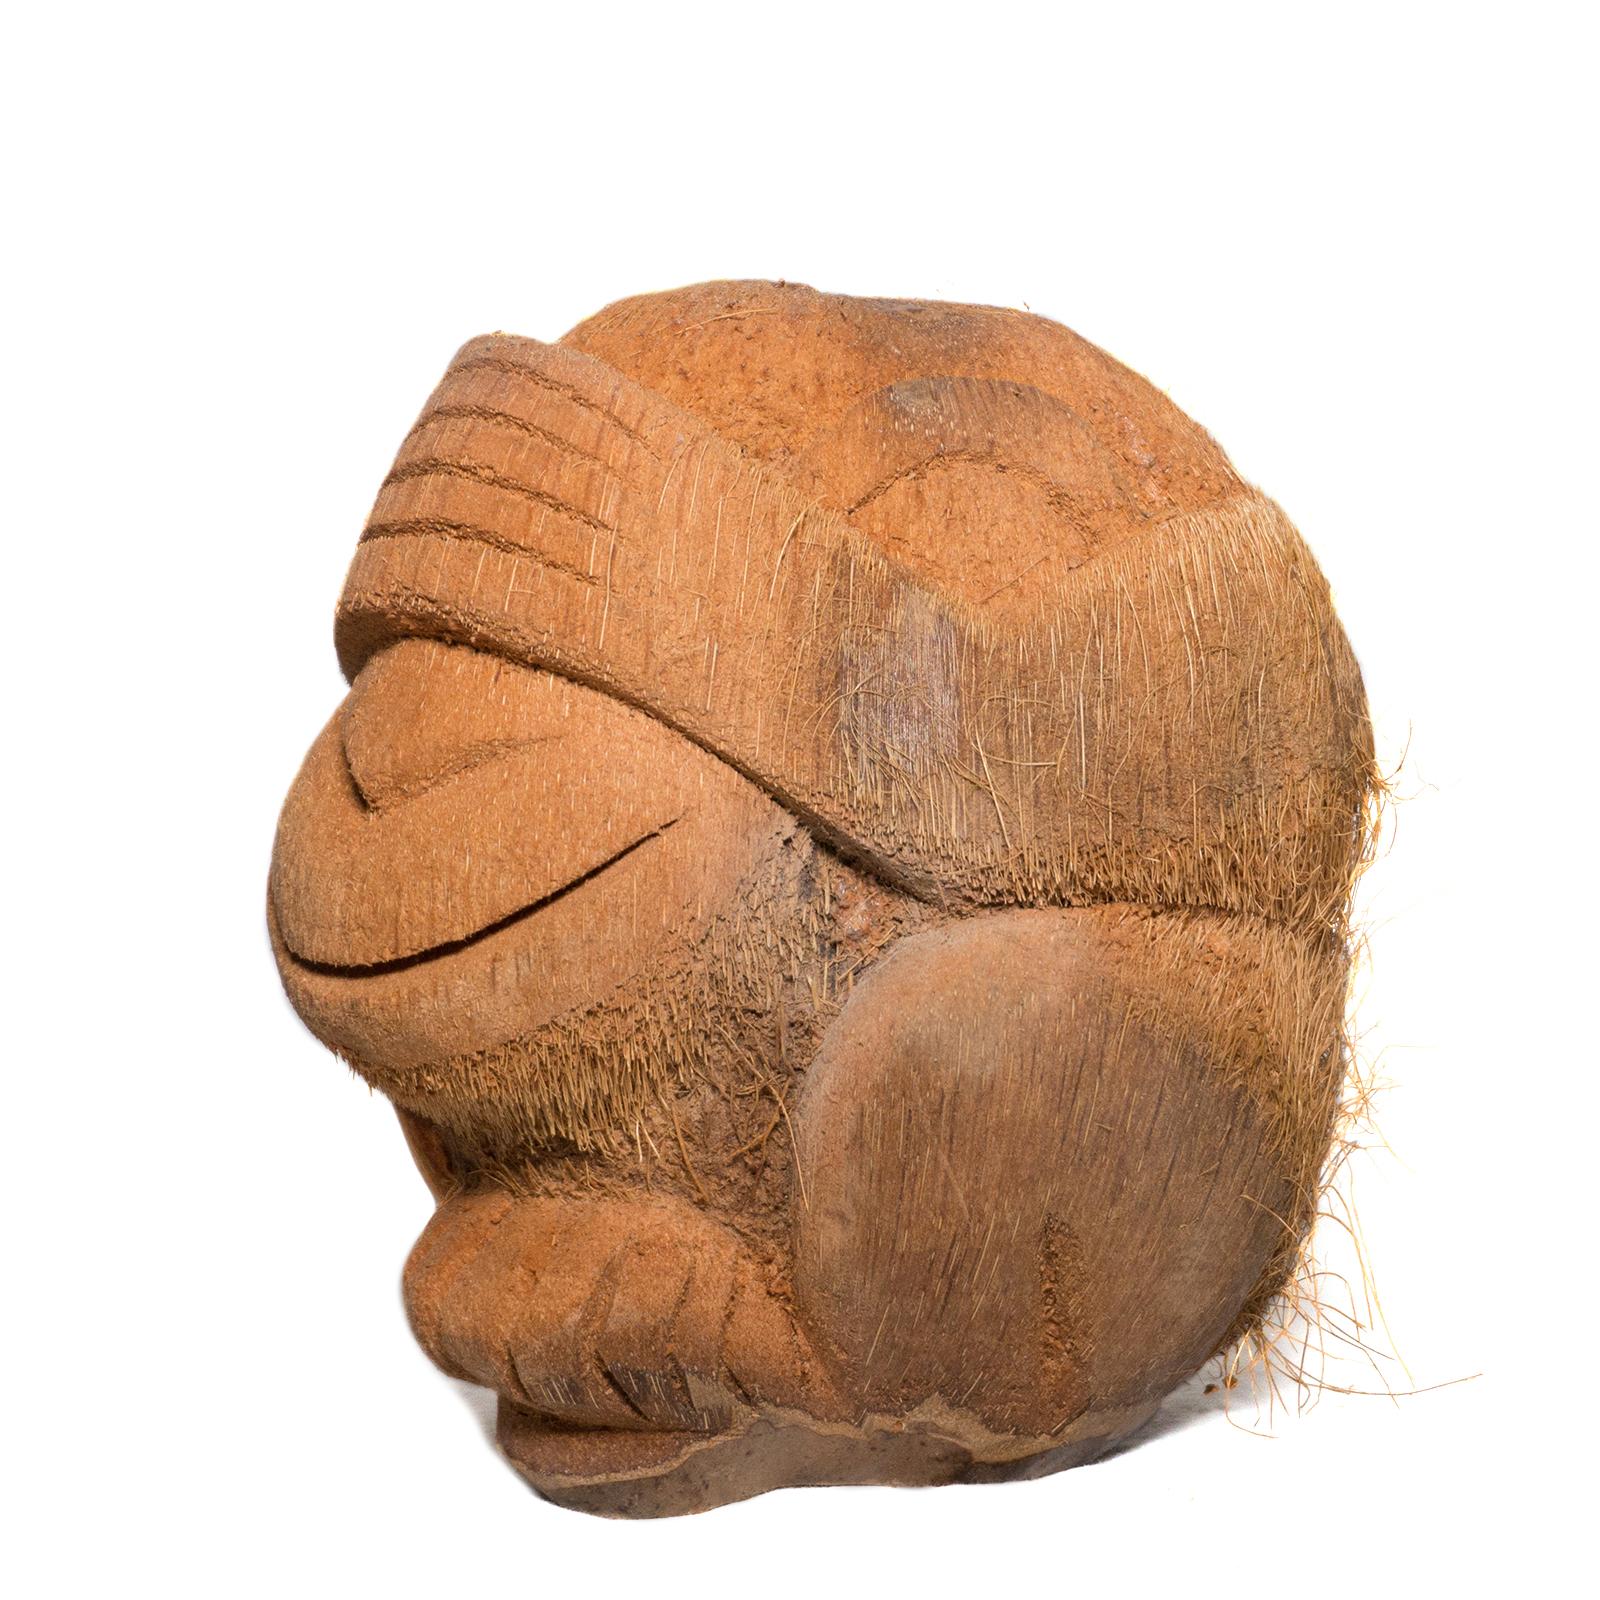 Sehe Nichts Affe Figur aus Kokosnuss ca. 18cm Skulptur – Bild 2